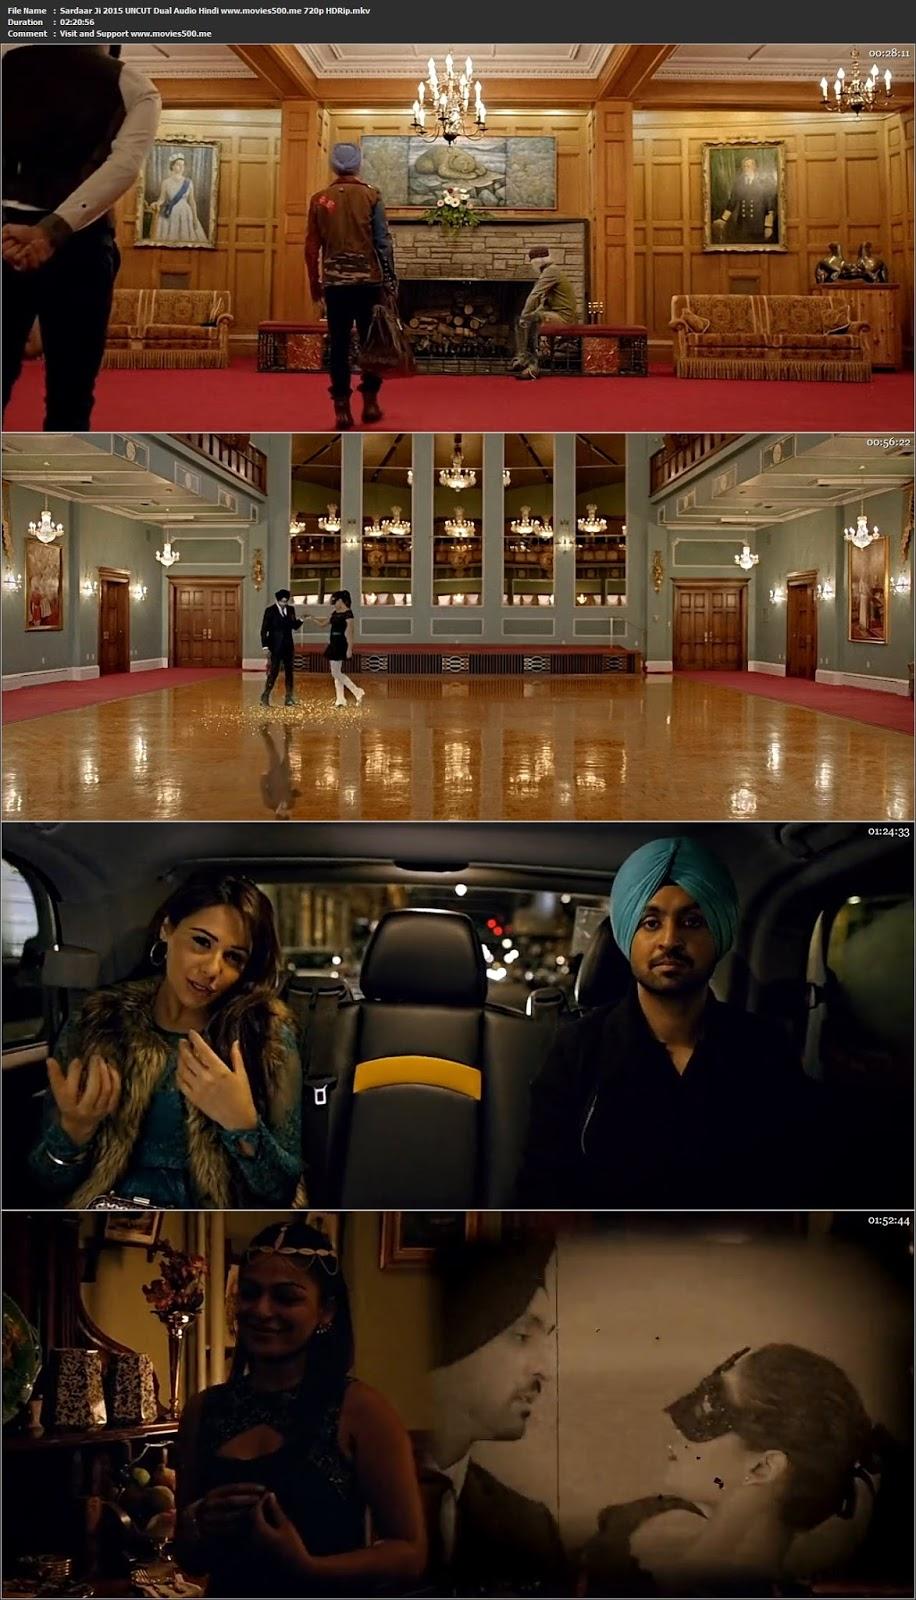 Sardaar Ji 2015 UNCUT Punjabi Movie HDRip 720p 1.4GB at sandrastclairphotography.com